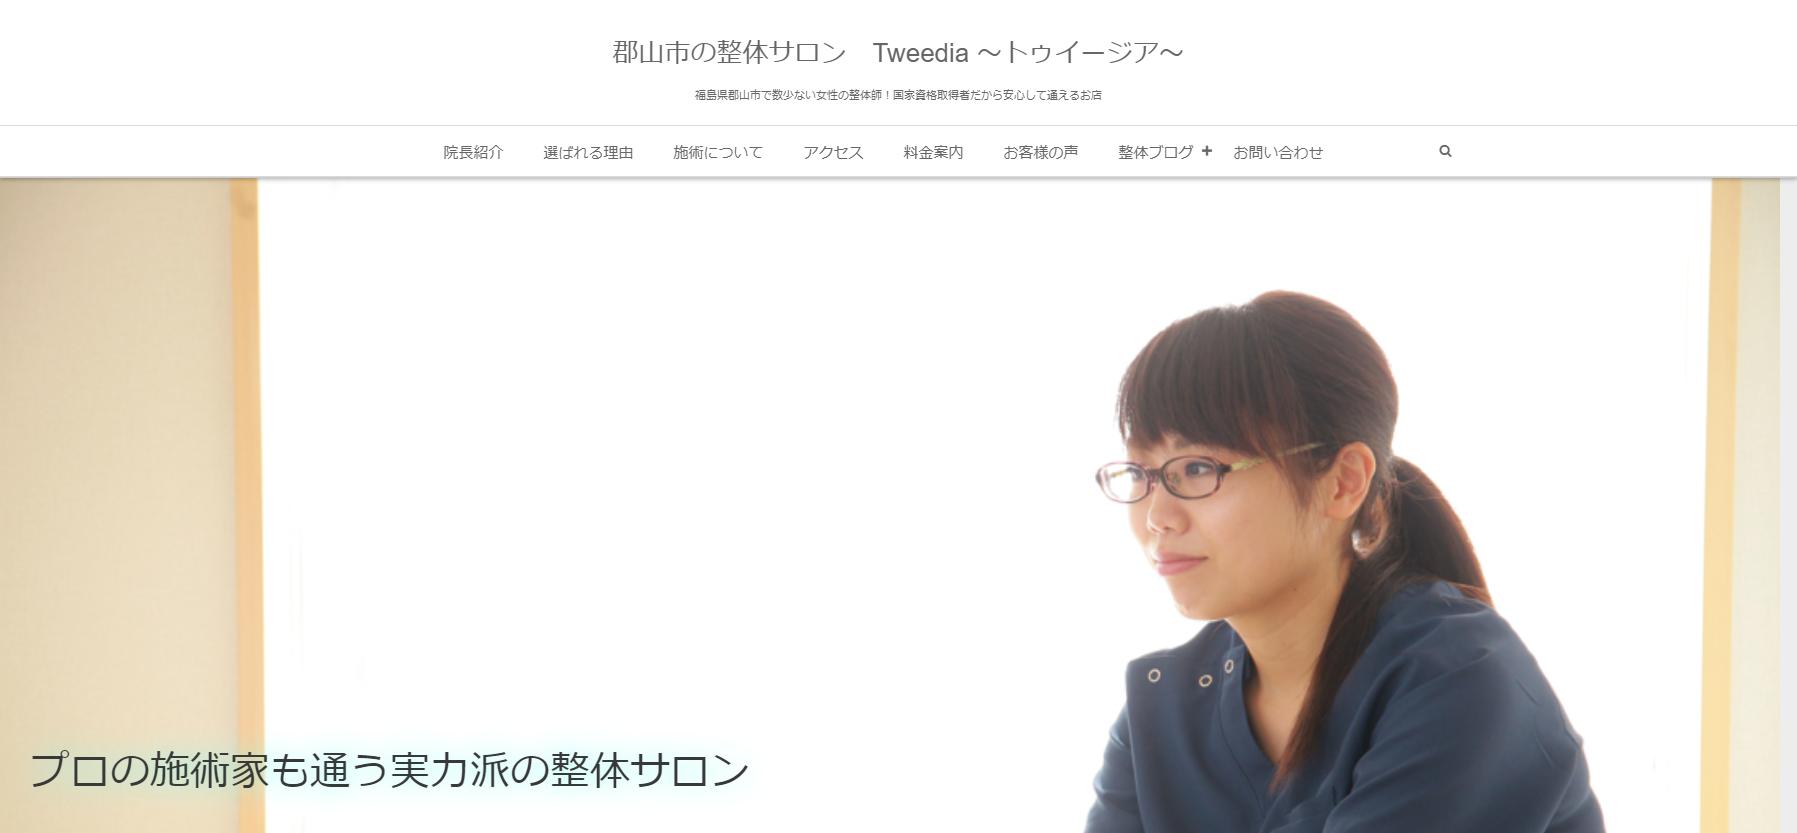 Tweedia 〜トゥイージア〜のサムネイル